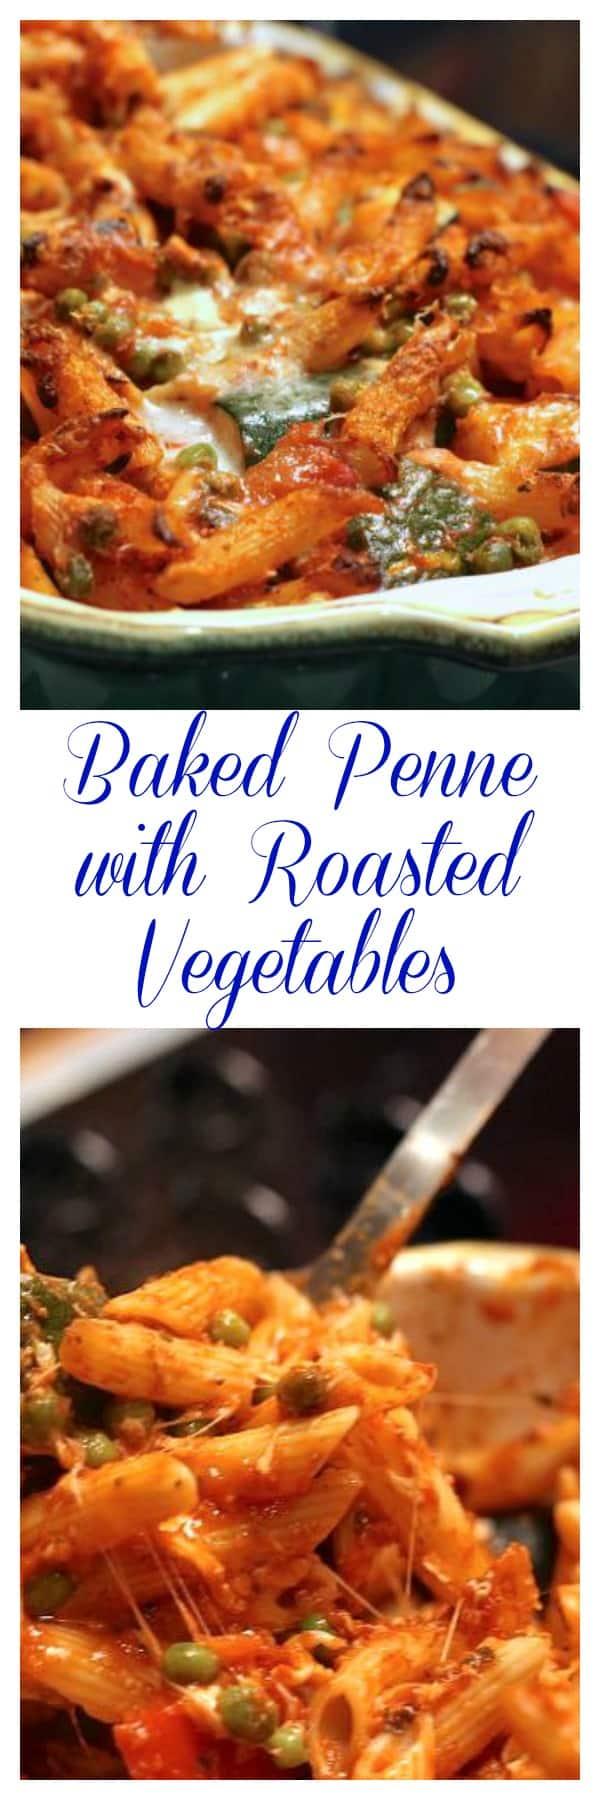 Baked Penne with Roasted Vegetables | www.zagleft.com